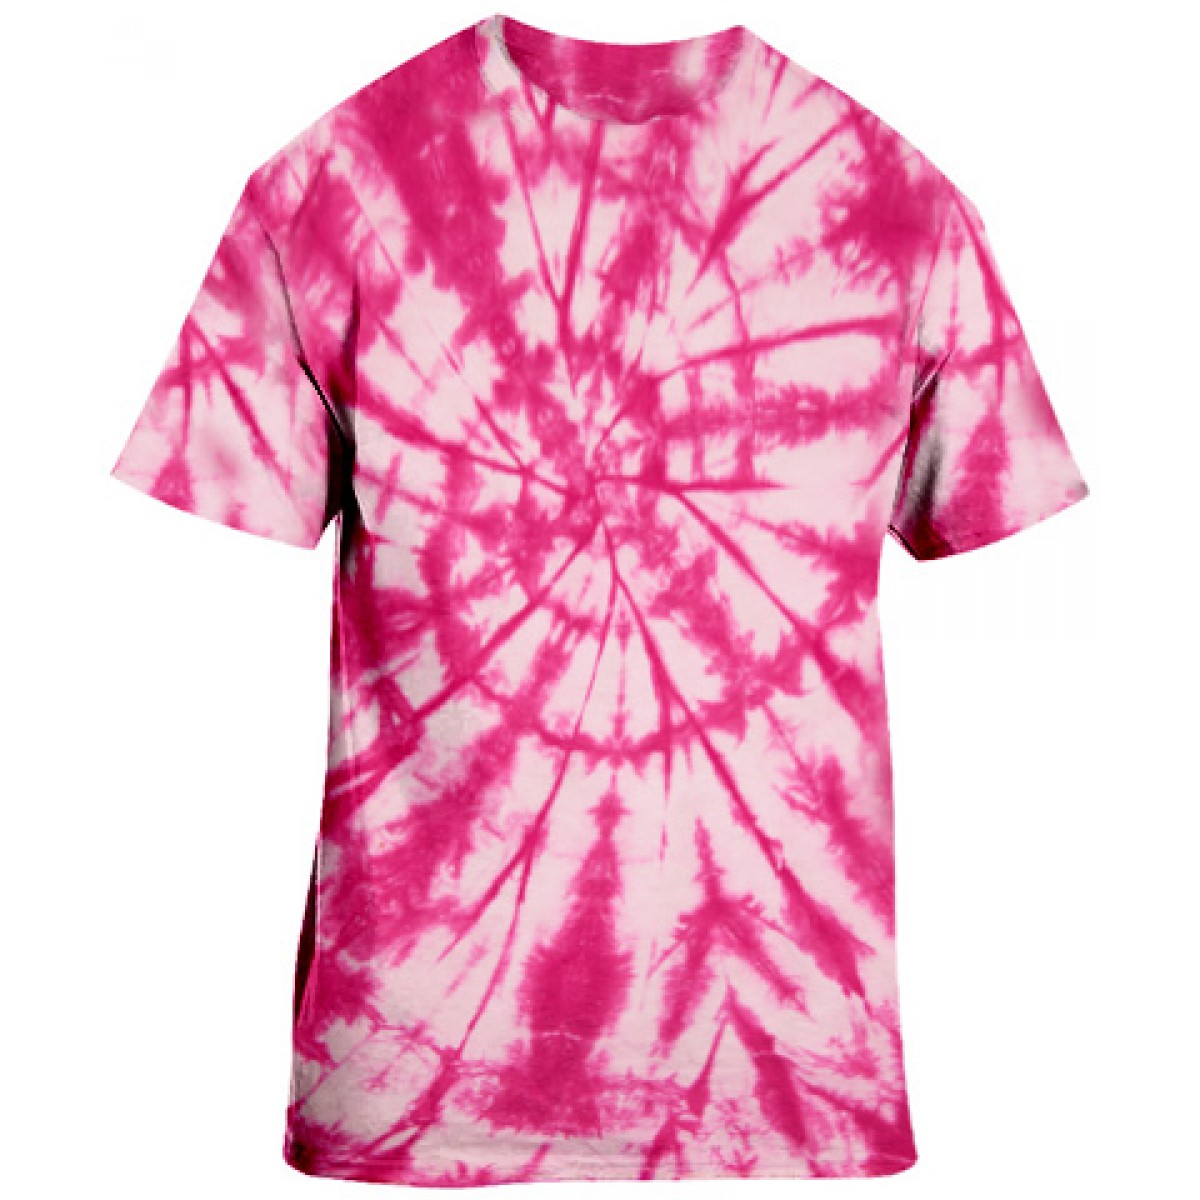 Pink Tie-Dye S/S Tee -Pink-S